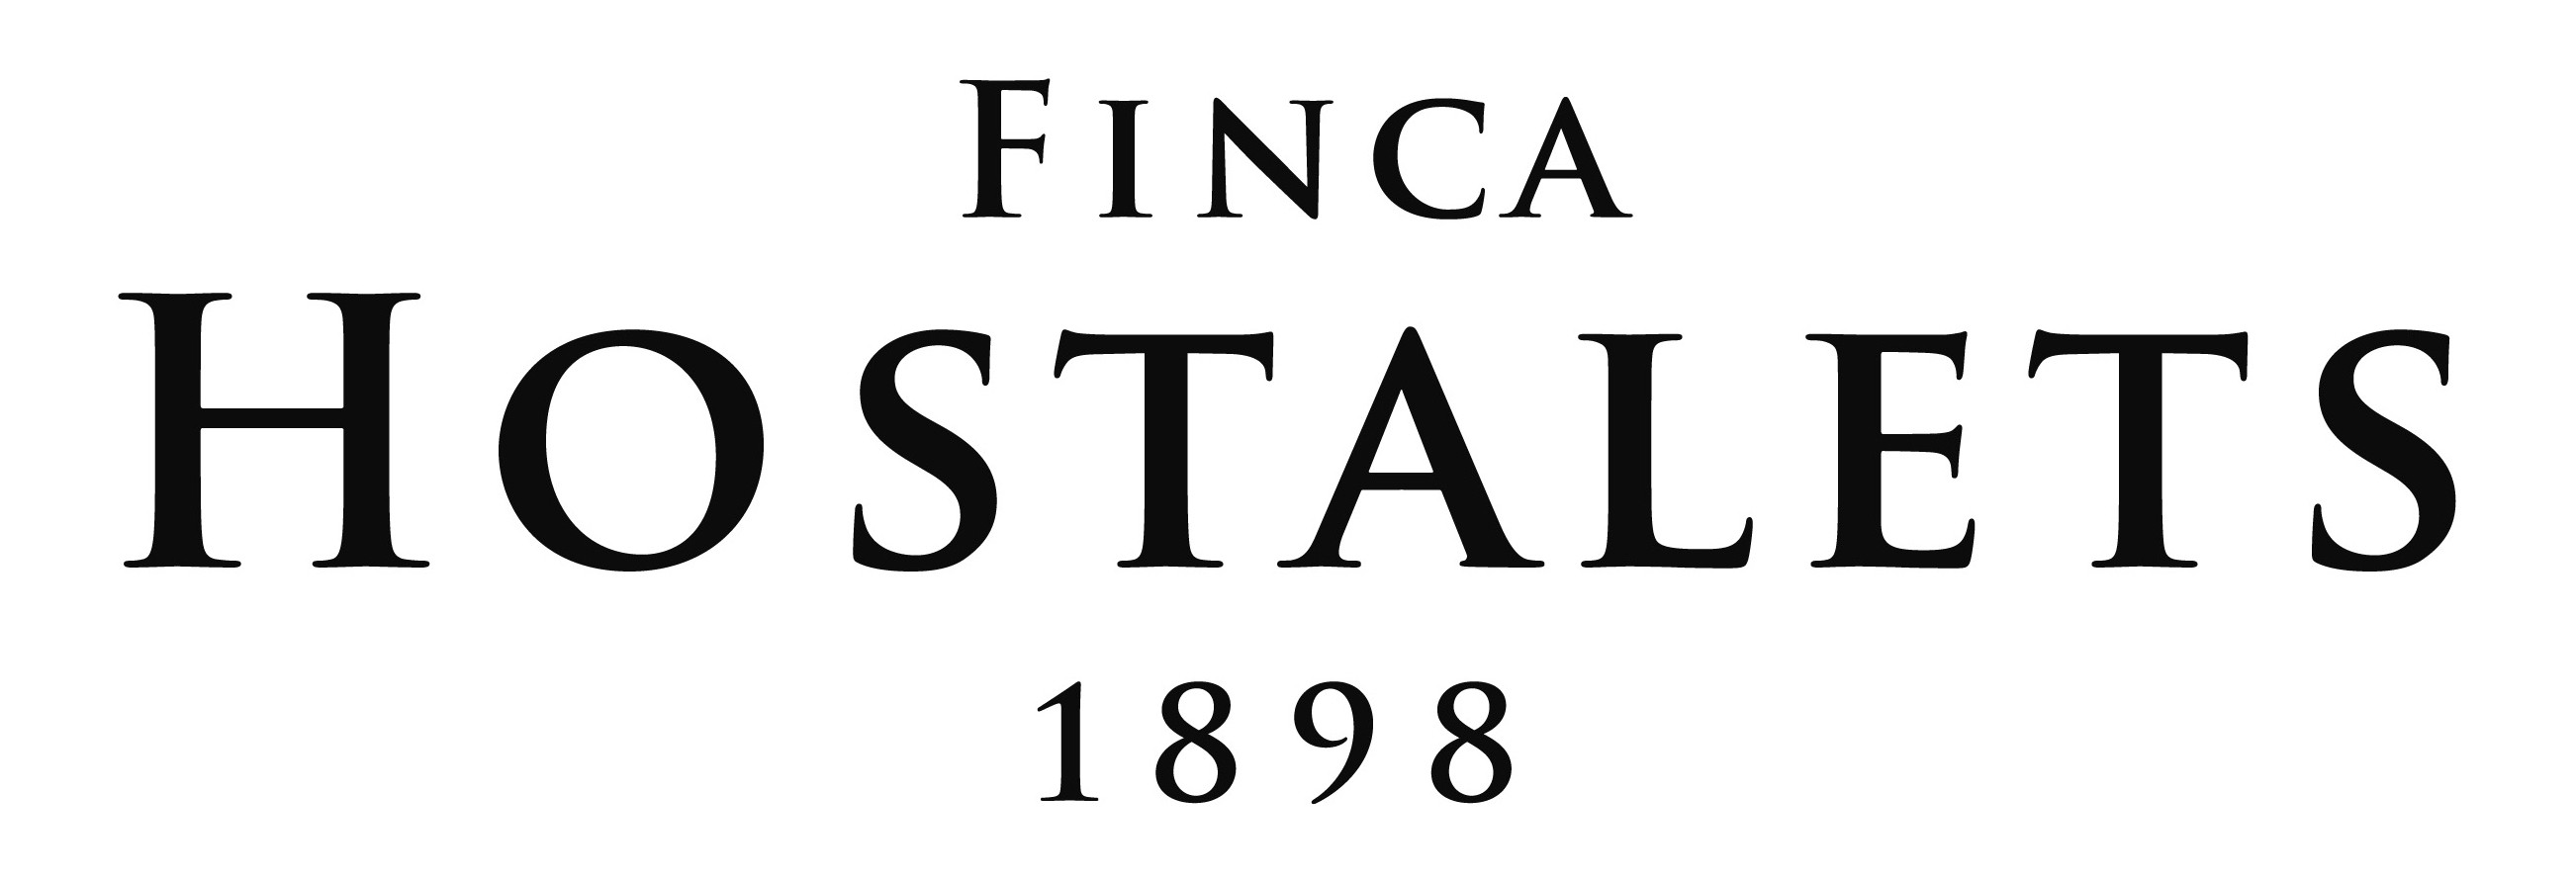 Finca Hostalets 1898